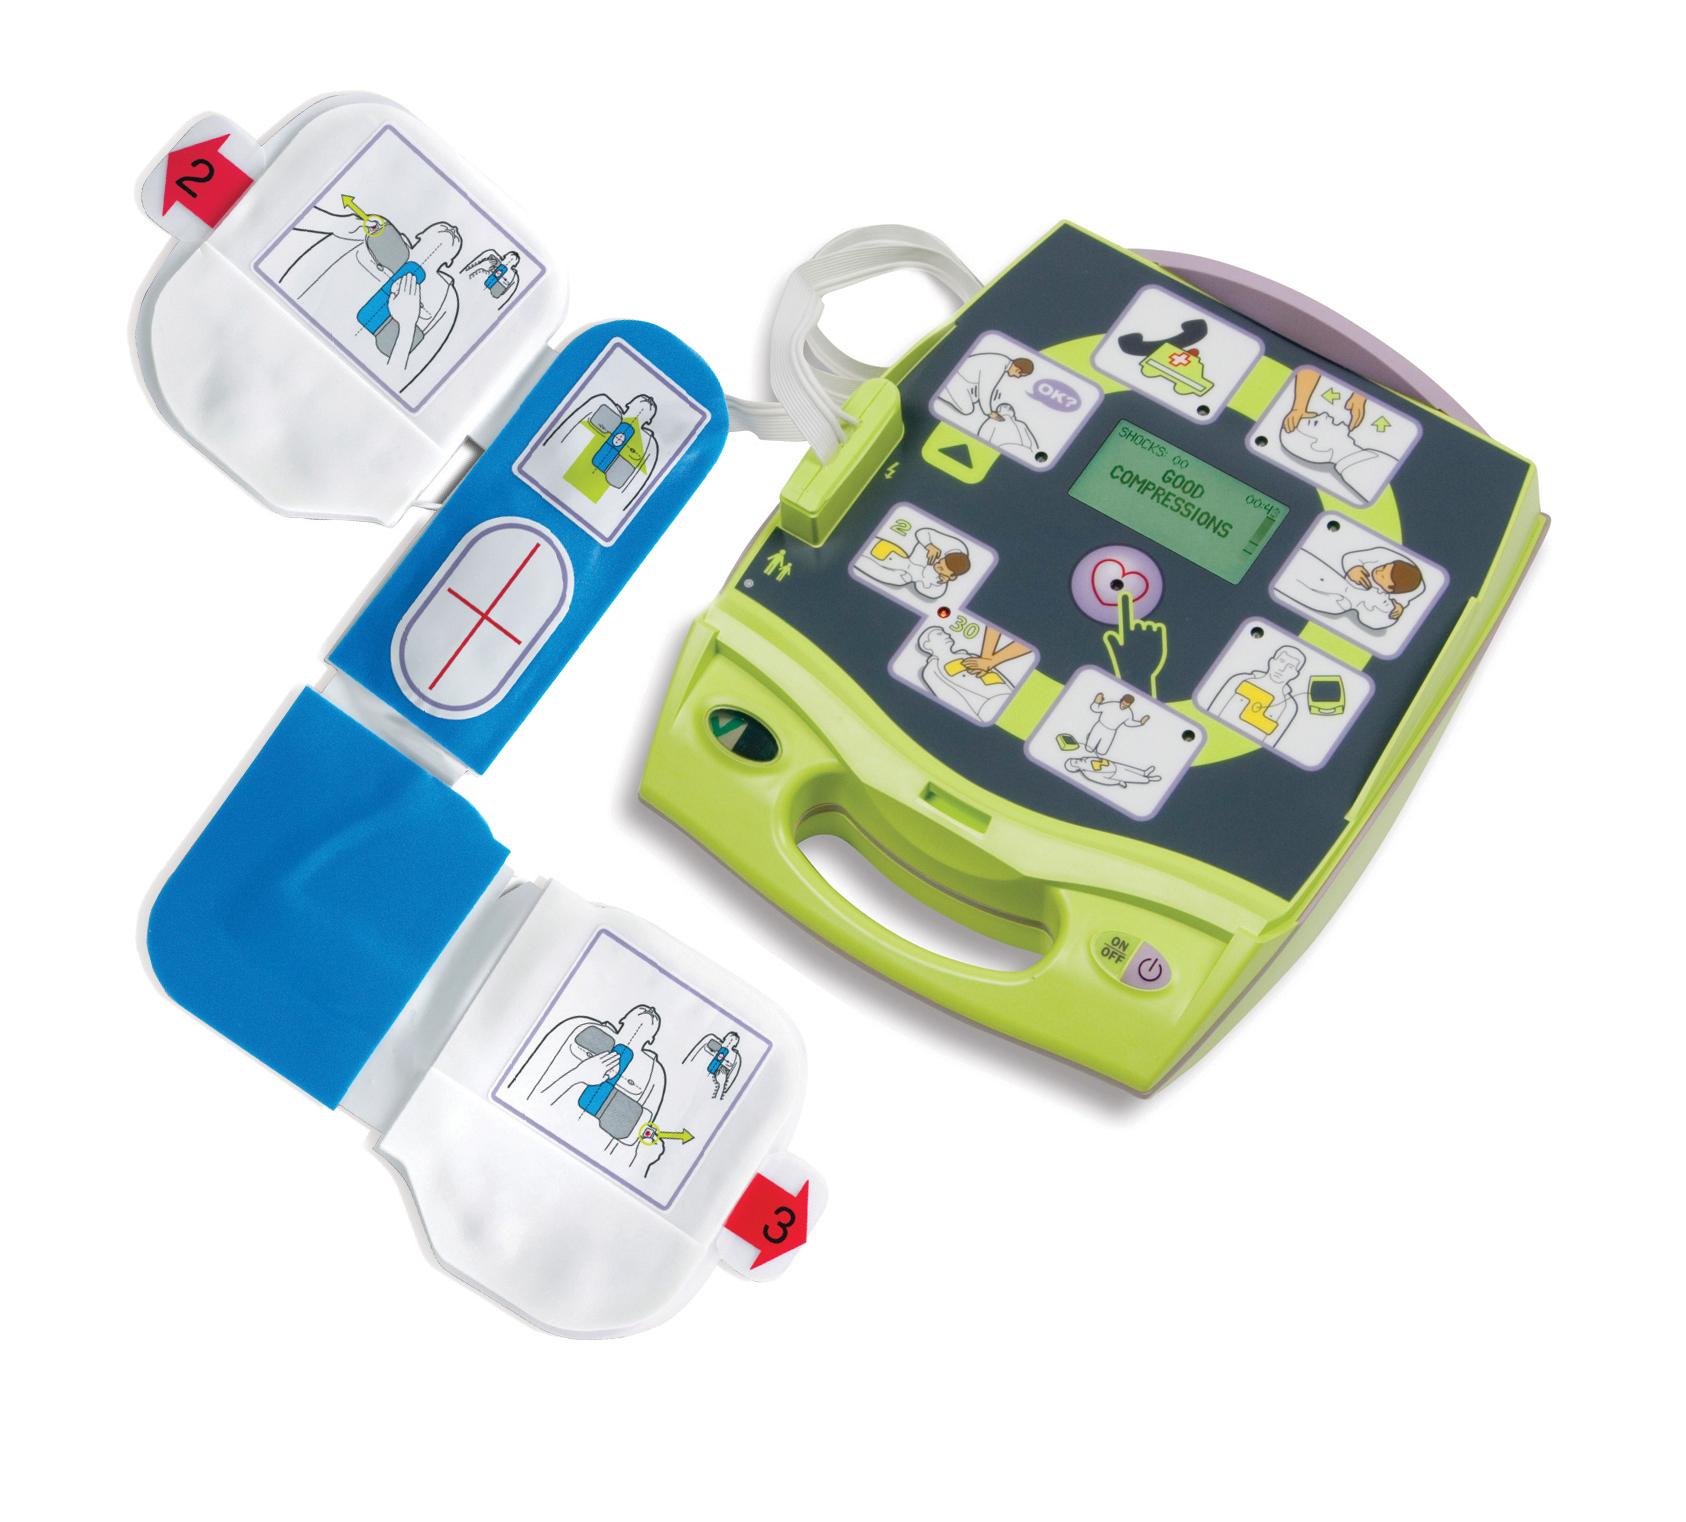 AED-Plus-lay-responder-erc-cprd-pads.jpg